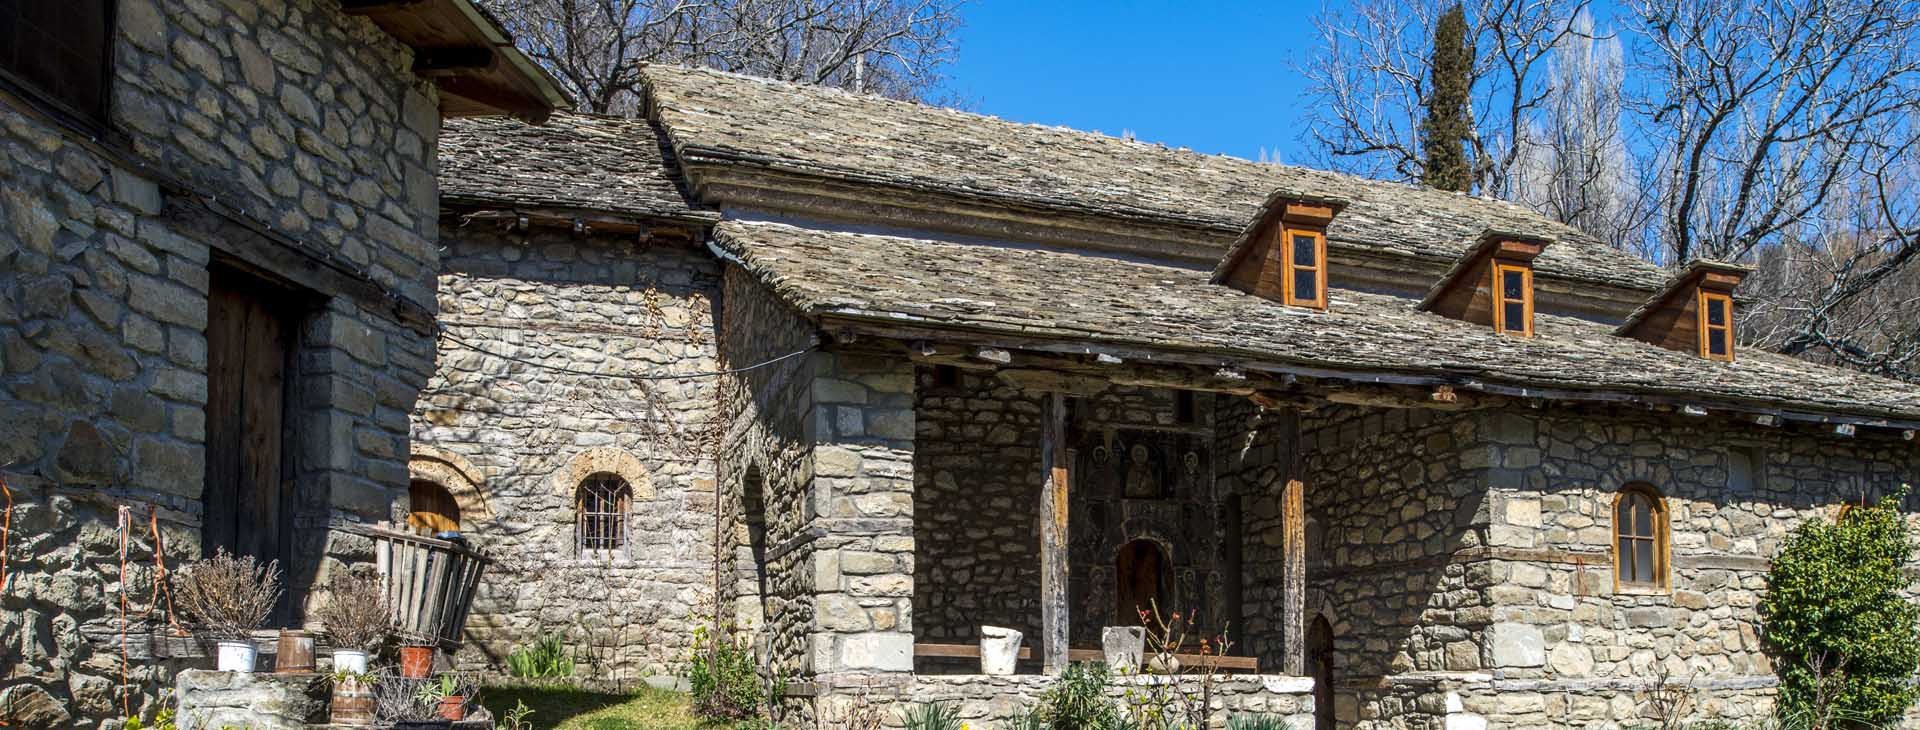 Monastery of Agios Nikolaos of Metsovo, Ioannina